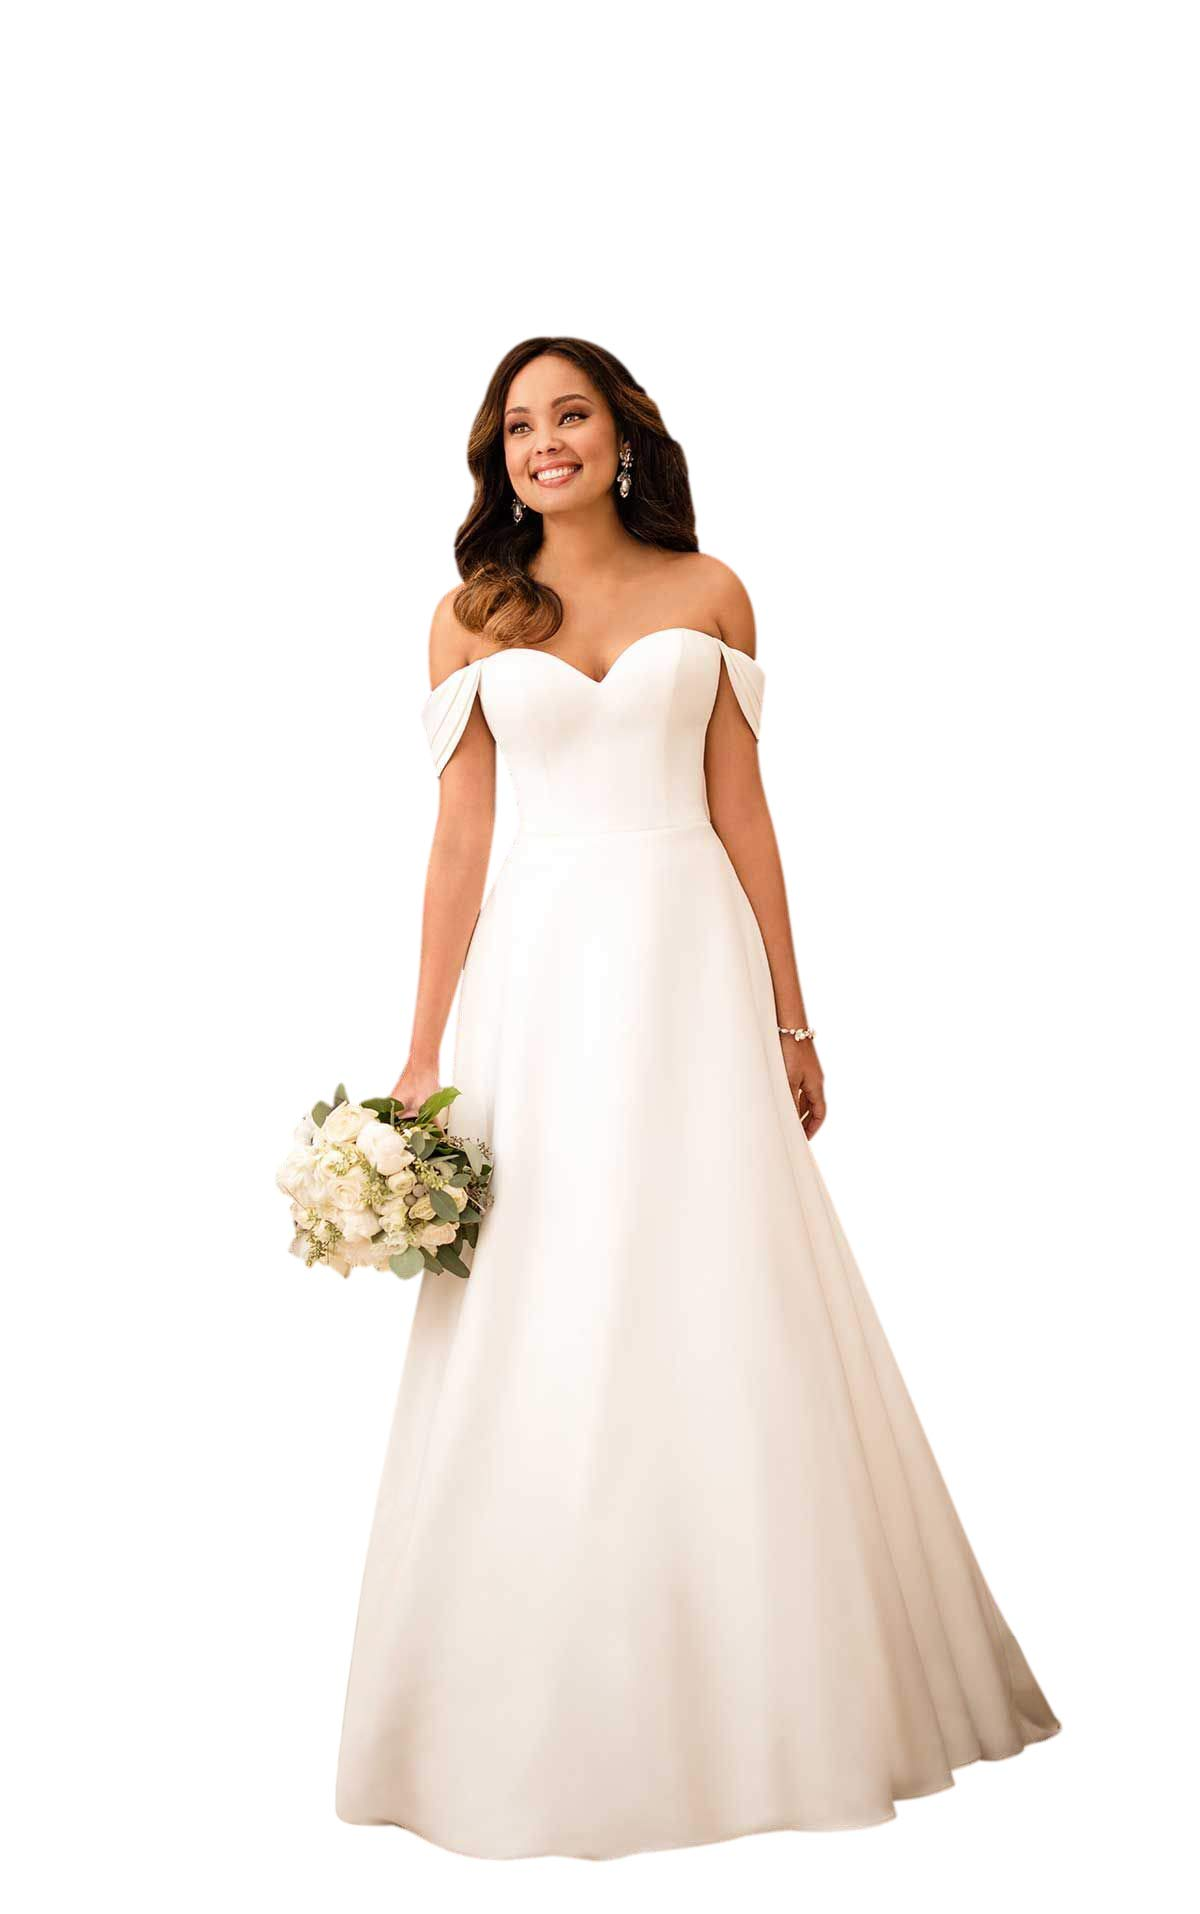 VinBridal Womens Backless Satin Long Bridal Gown Wedding Dress with Train